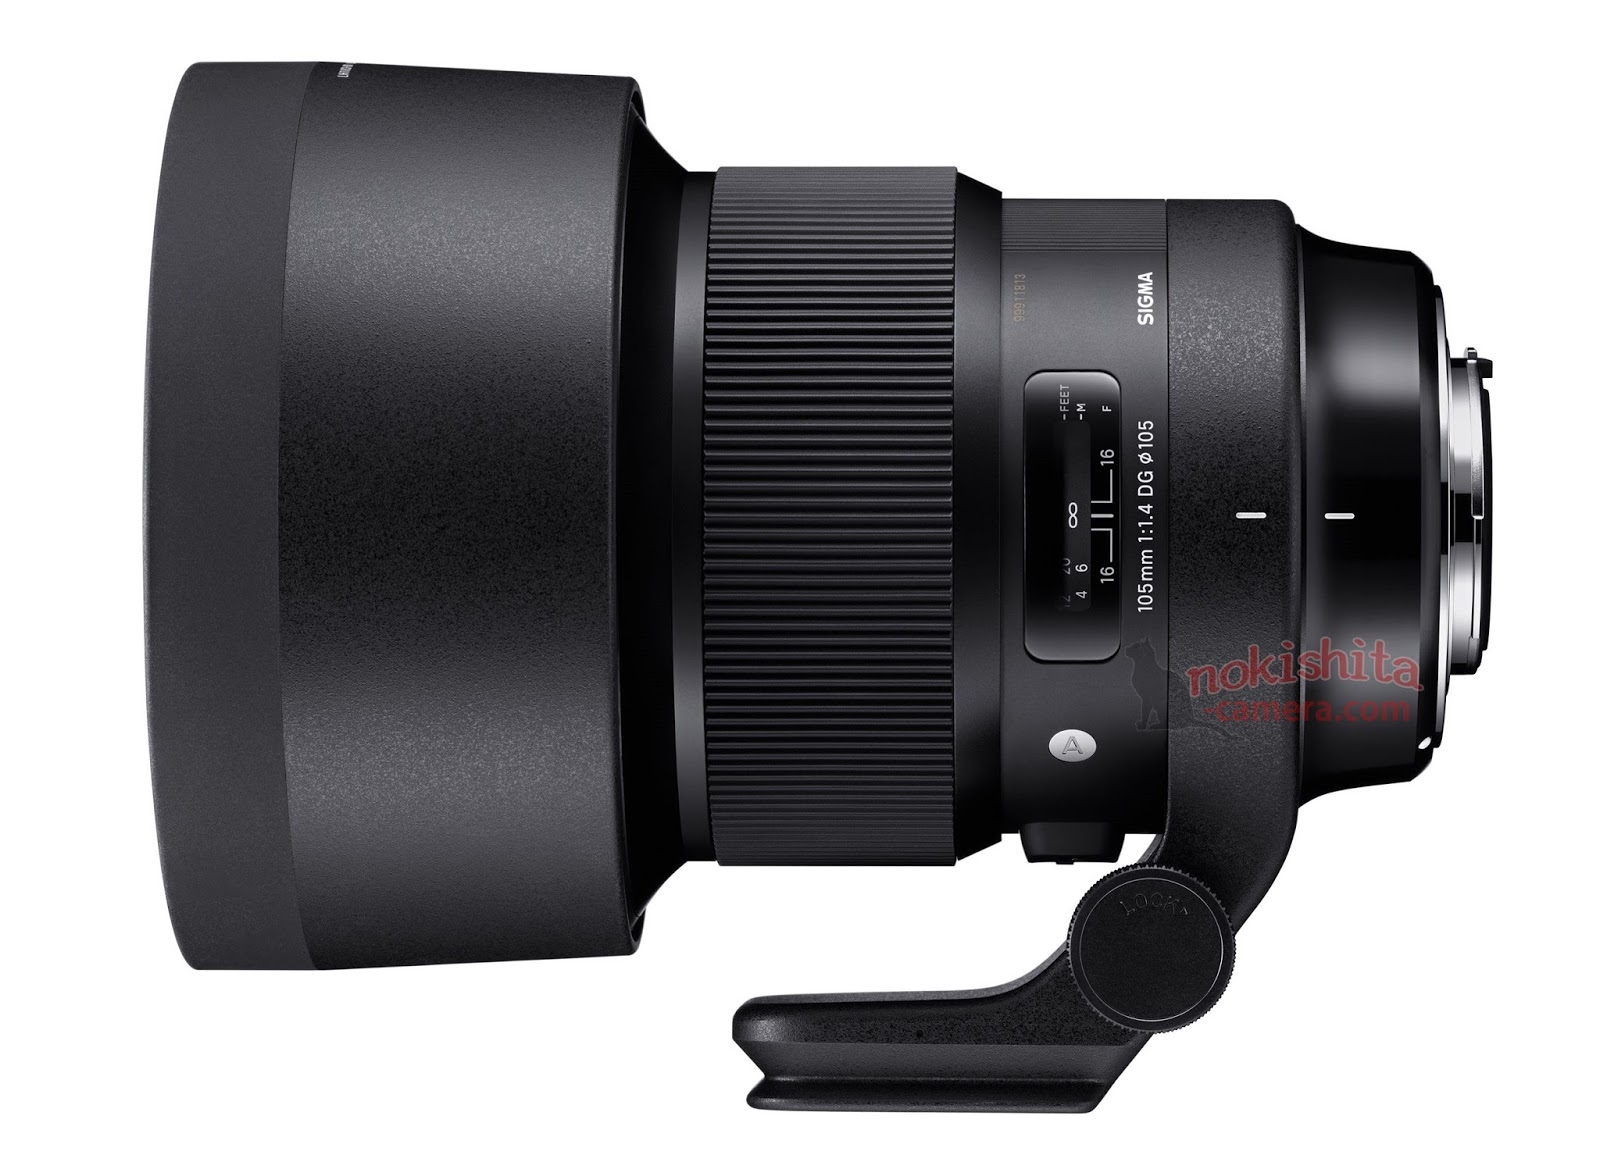 Sigma Will Announce 9 Fe Lenses For Sony E Mount Mirrorless Cameras Alpha 7 Mark Ii 58 70mm 105mm F 14 Dg Hsm Art Lens